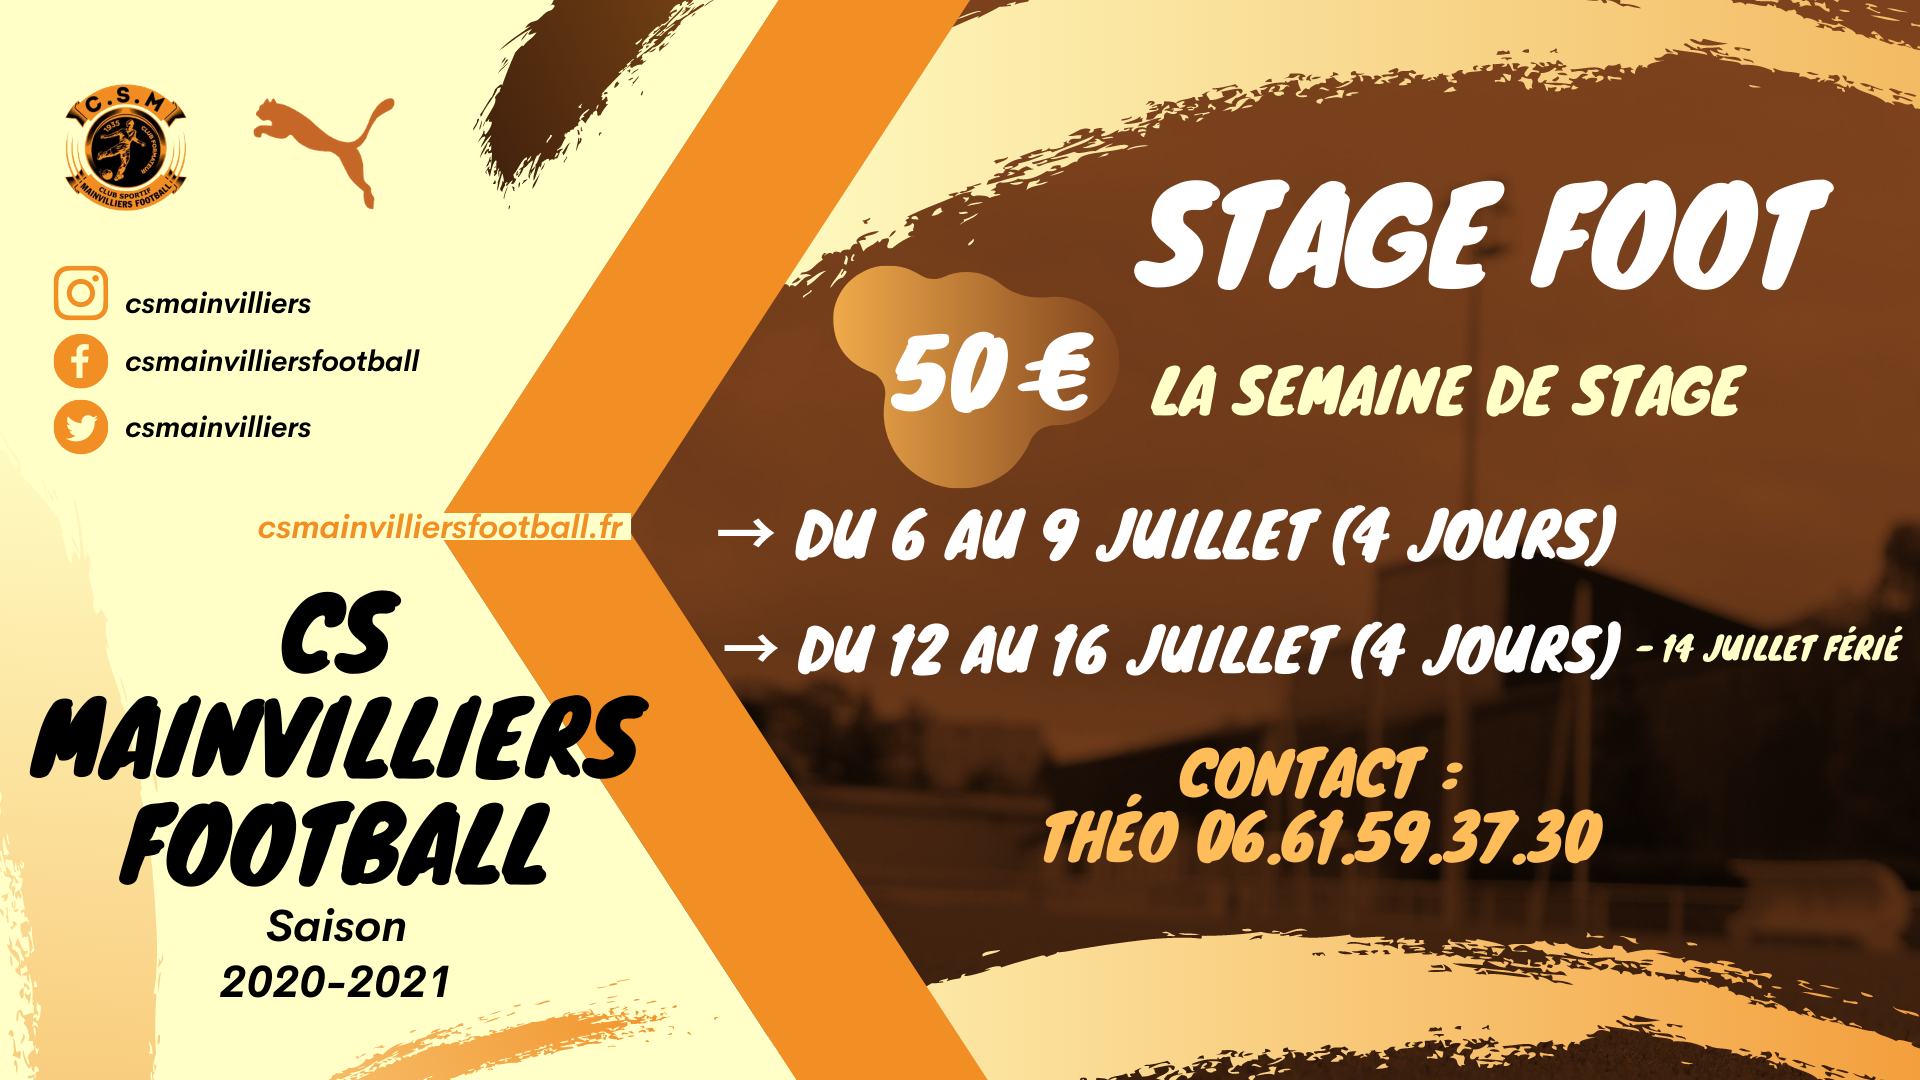 Stage Foot - Vacances d'Été - CS Mainvilliers Football